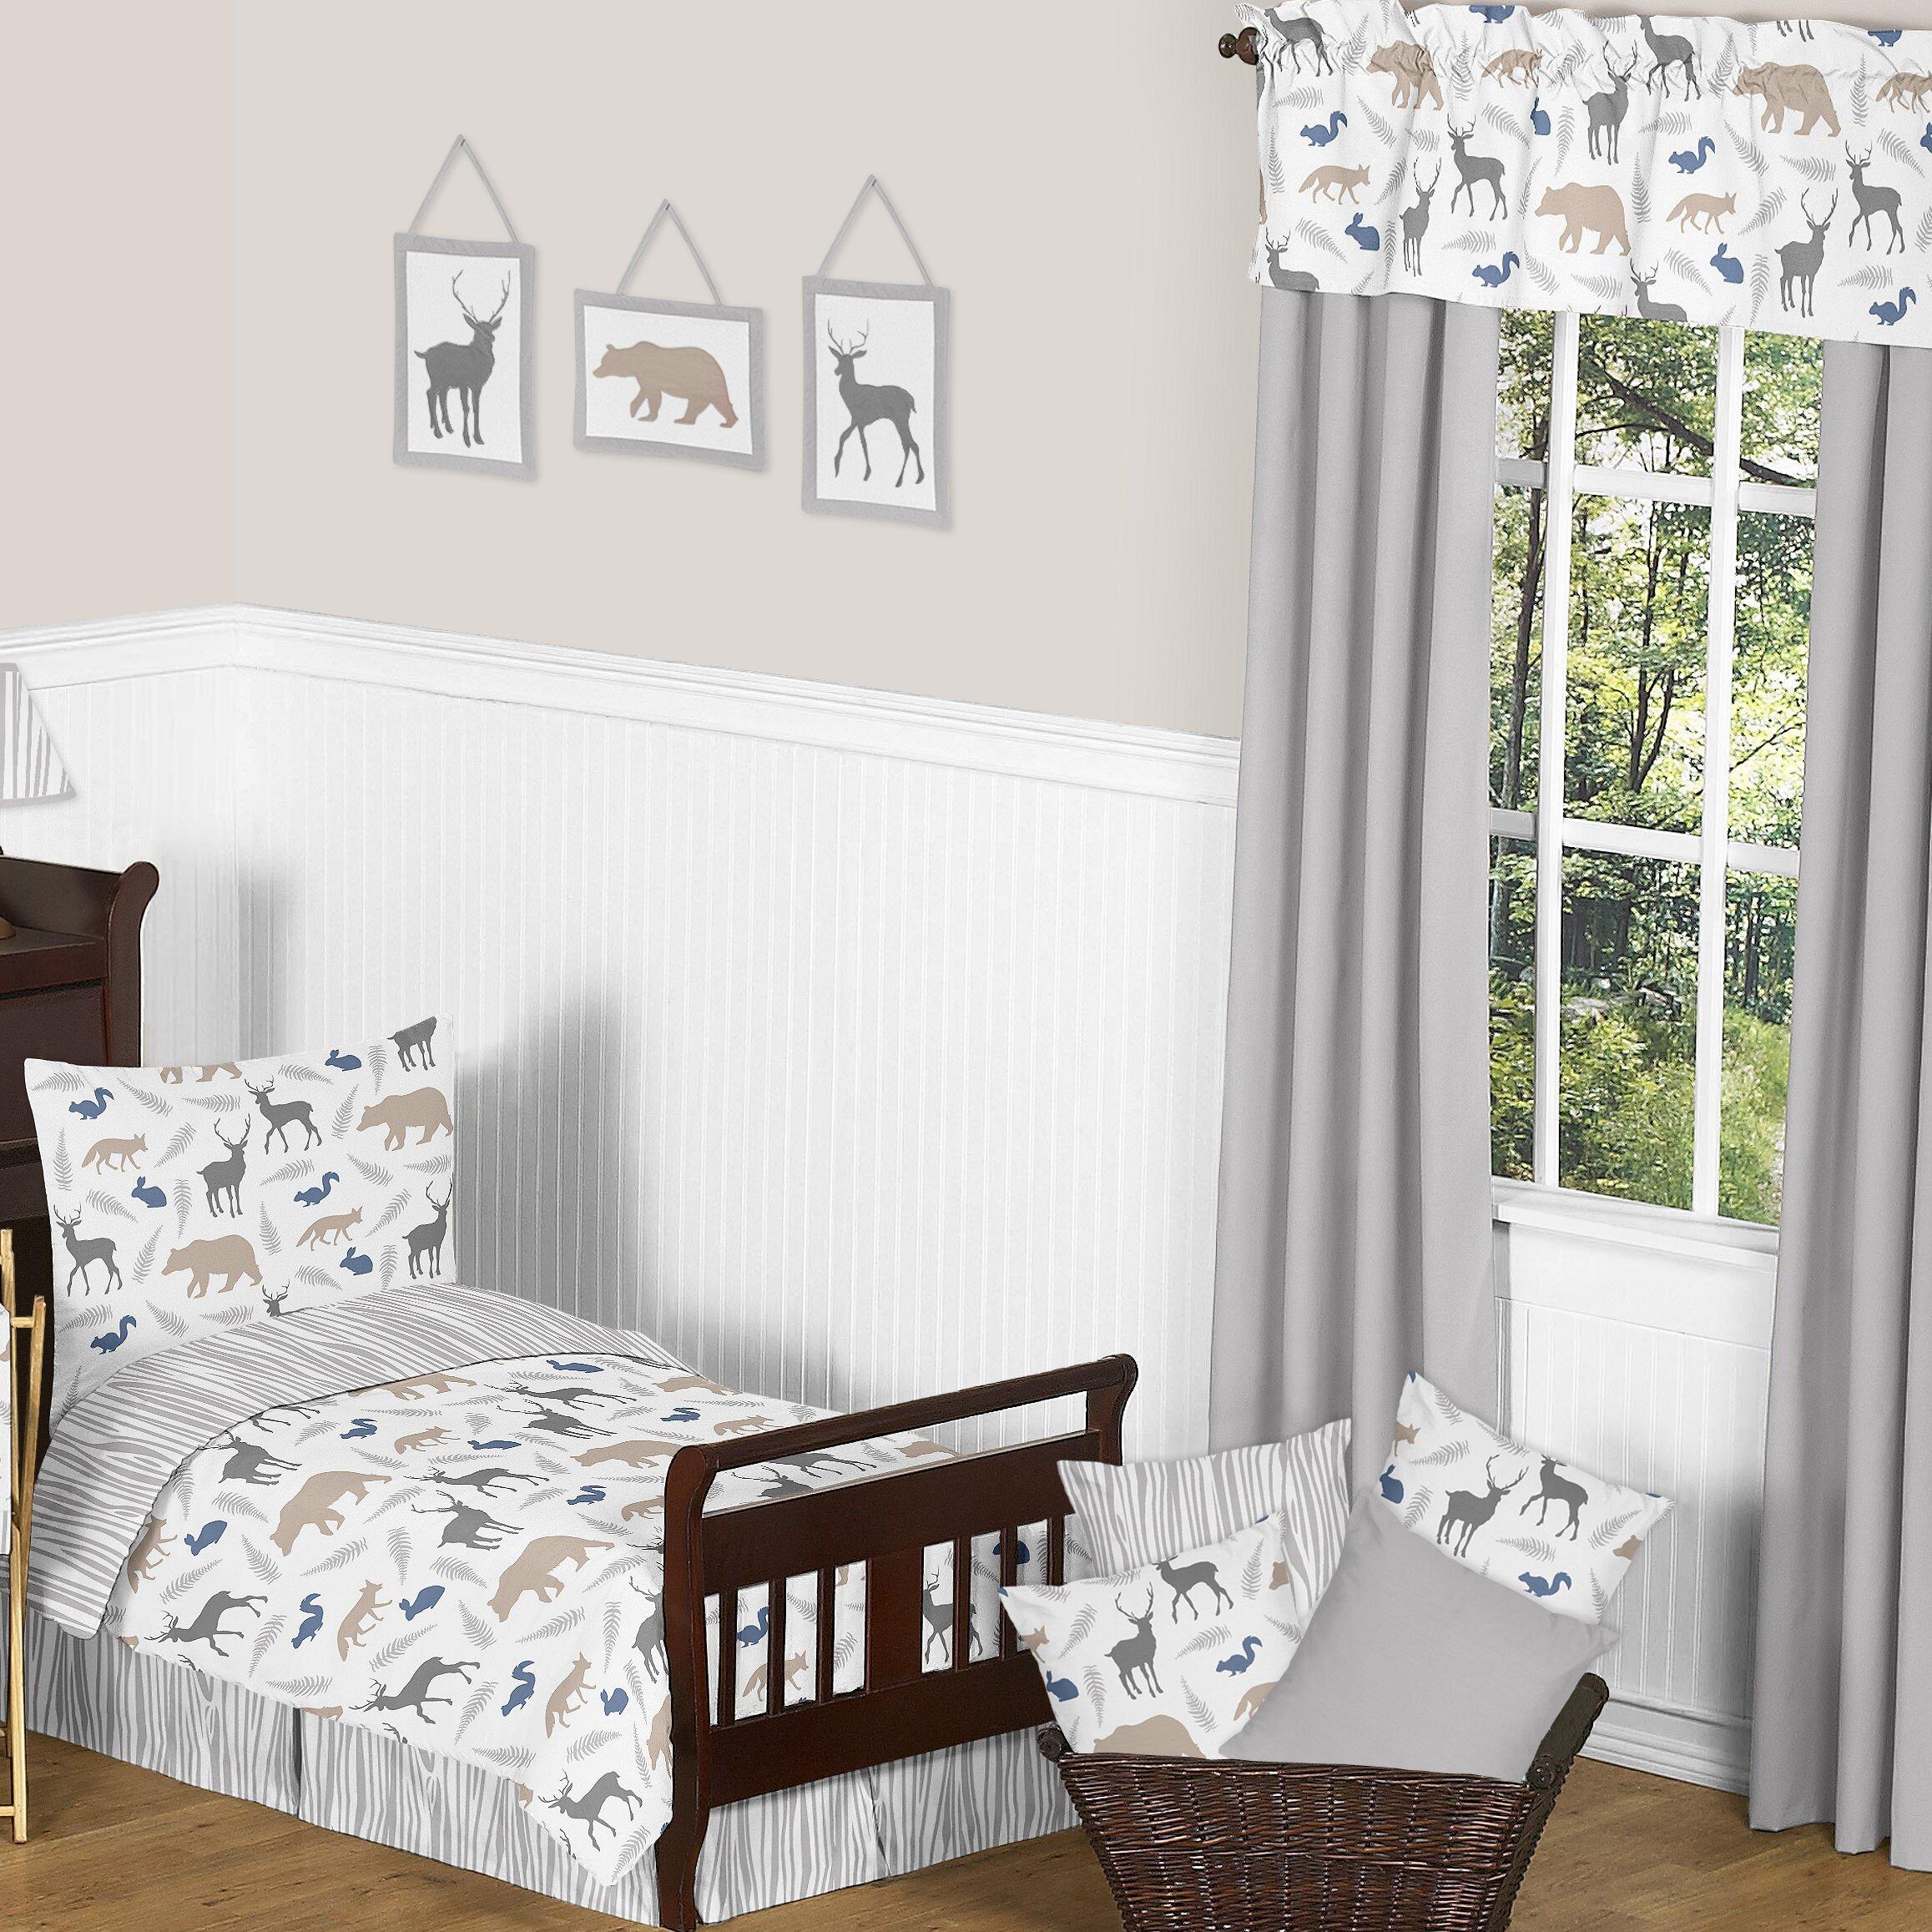 79 Handpicked Dining Room Ideas For Sweet Home: Sweet Jojo Designs Woodland Animals Window Curtain Valance